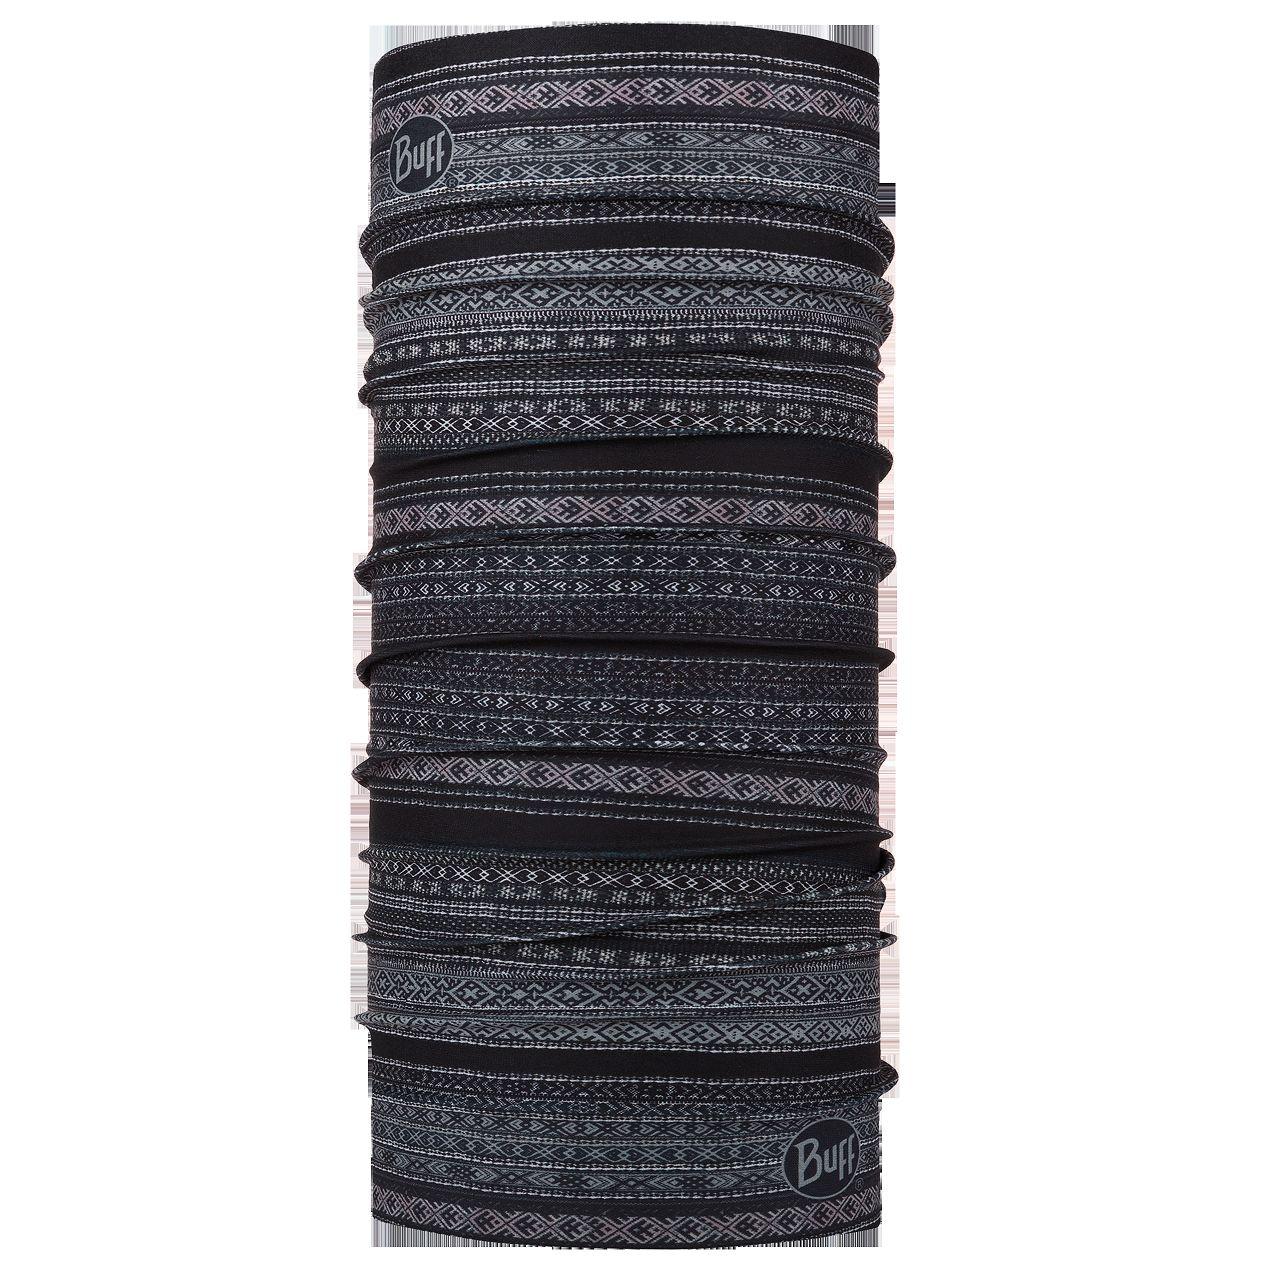 Original Buff Multifunctional Headwear Neck Tube Afgan Black